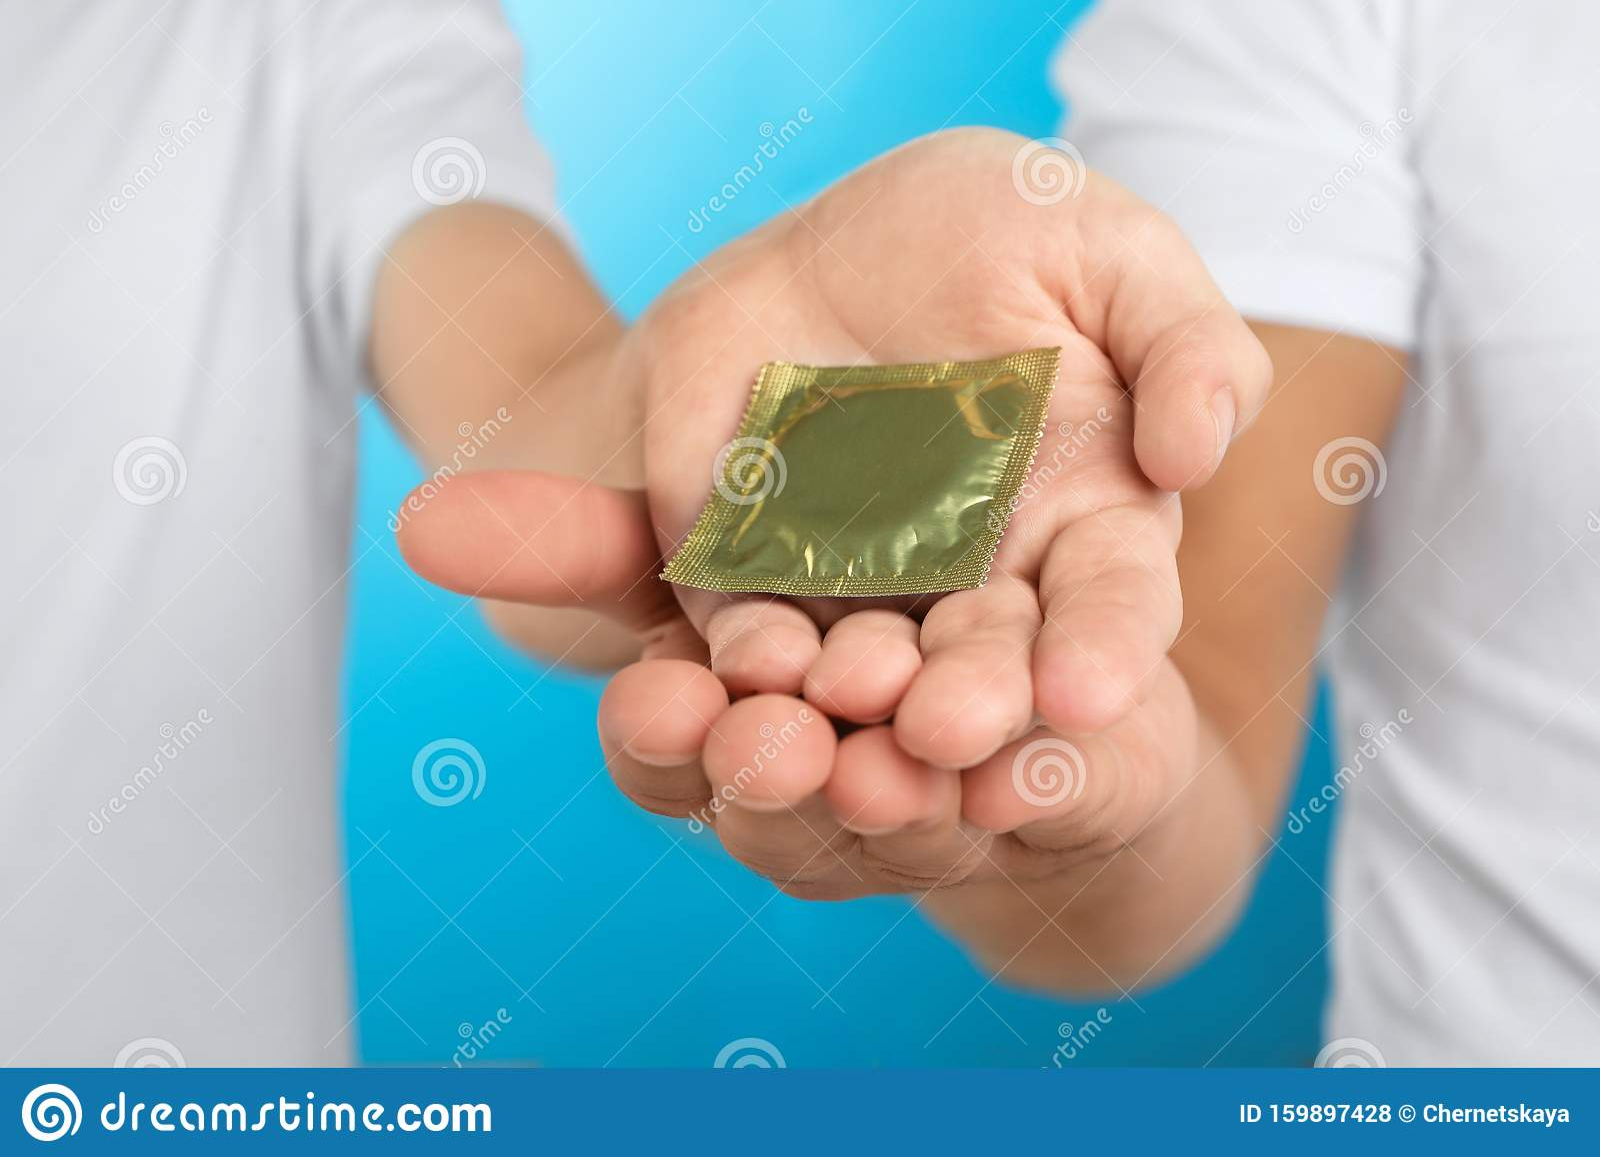 pictures Gay condom